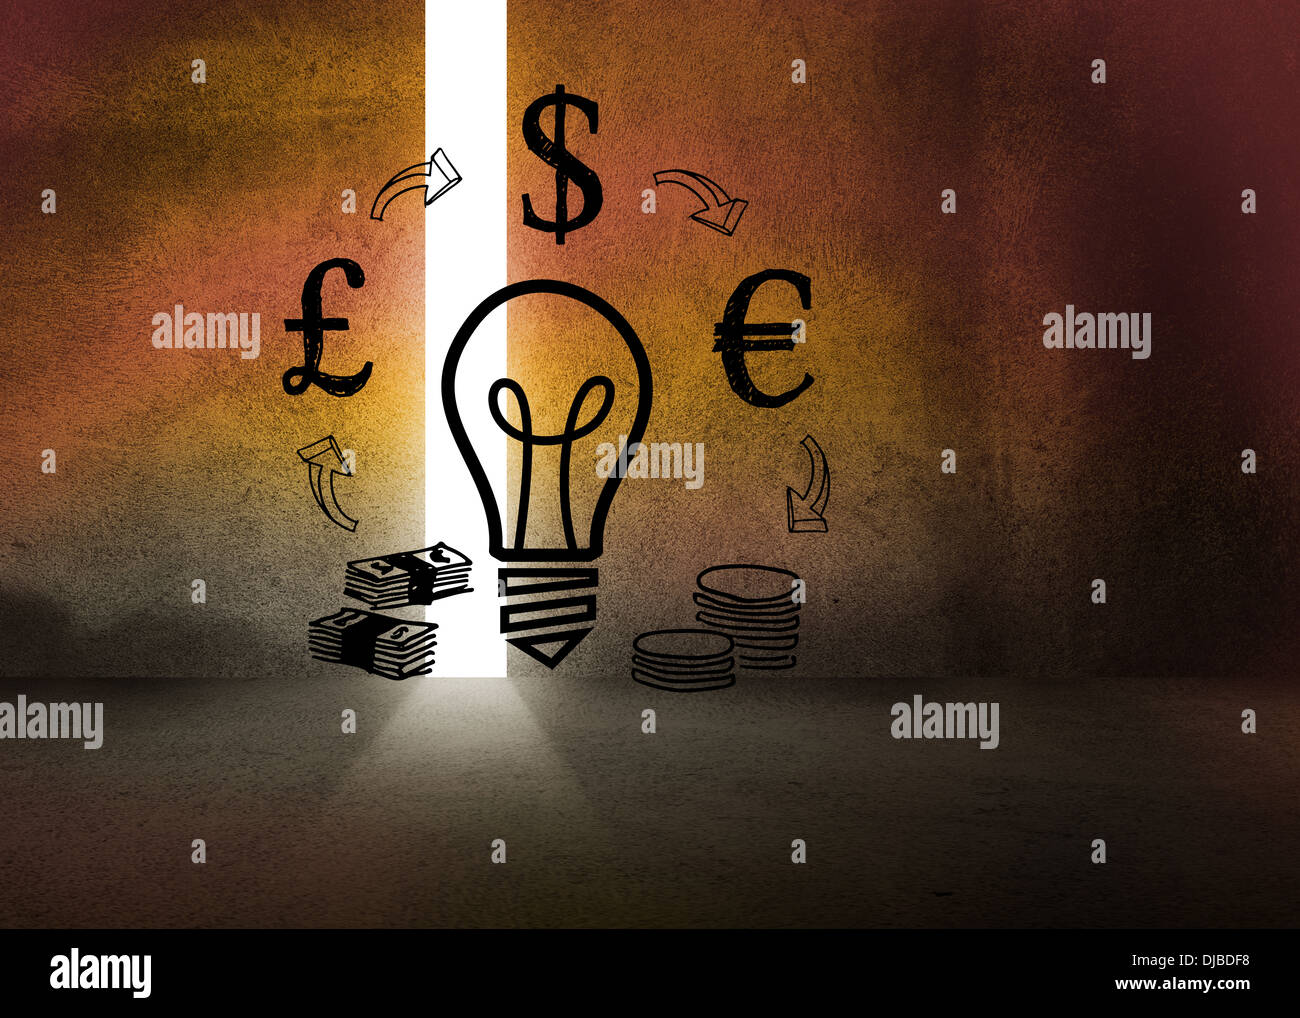 Dark room with light bulb - Light Bulb And Money In Dark Room